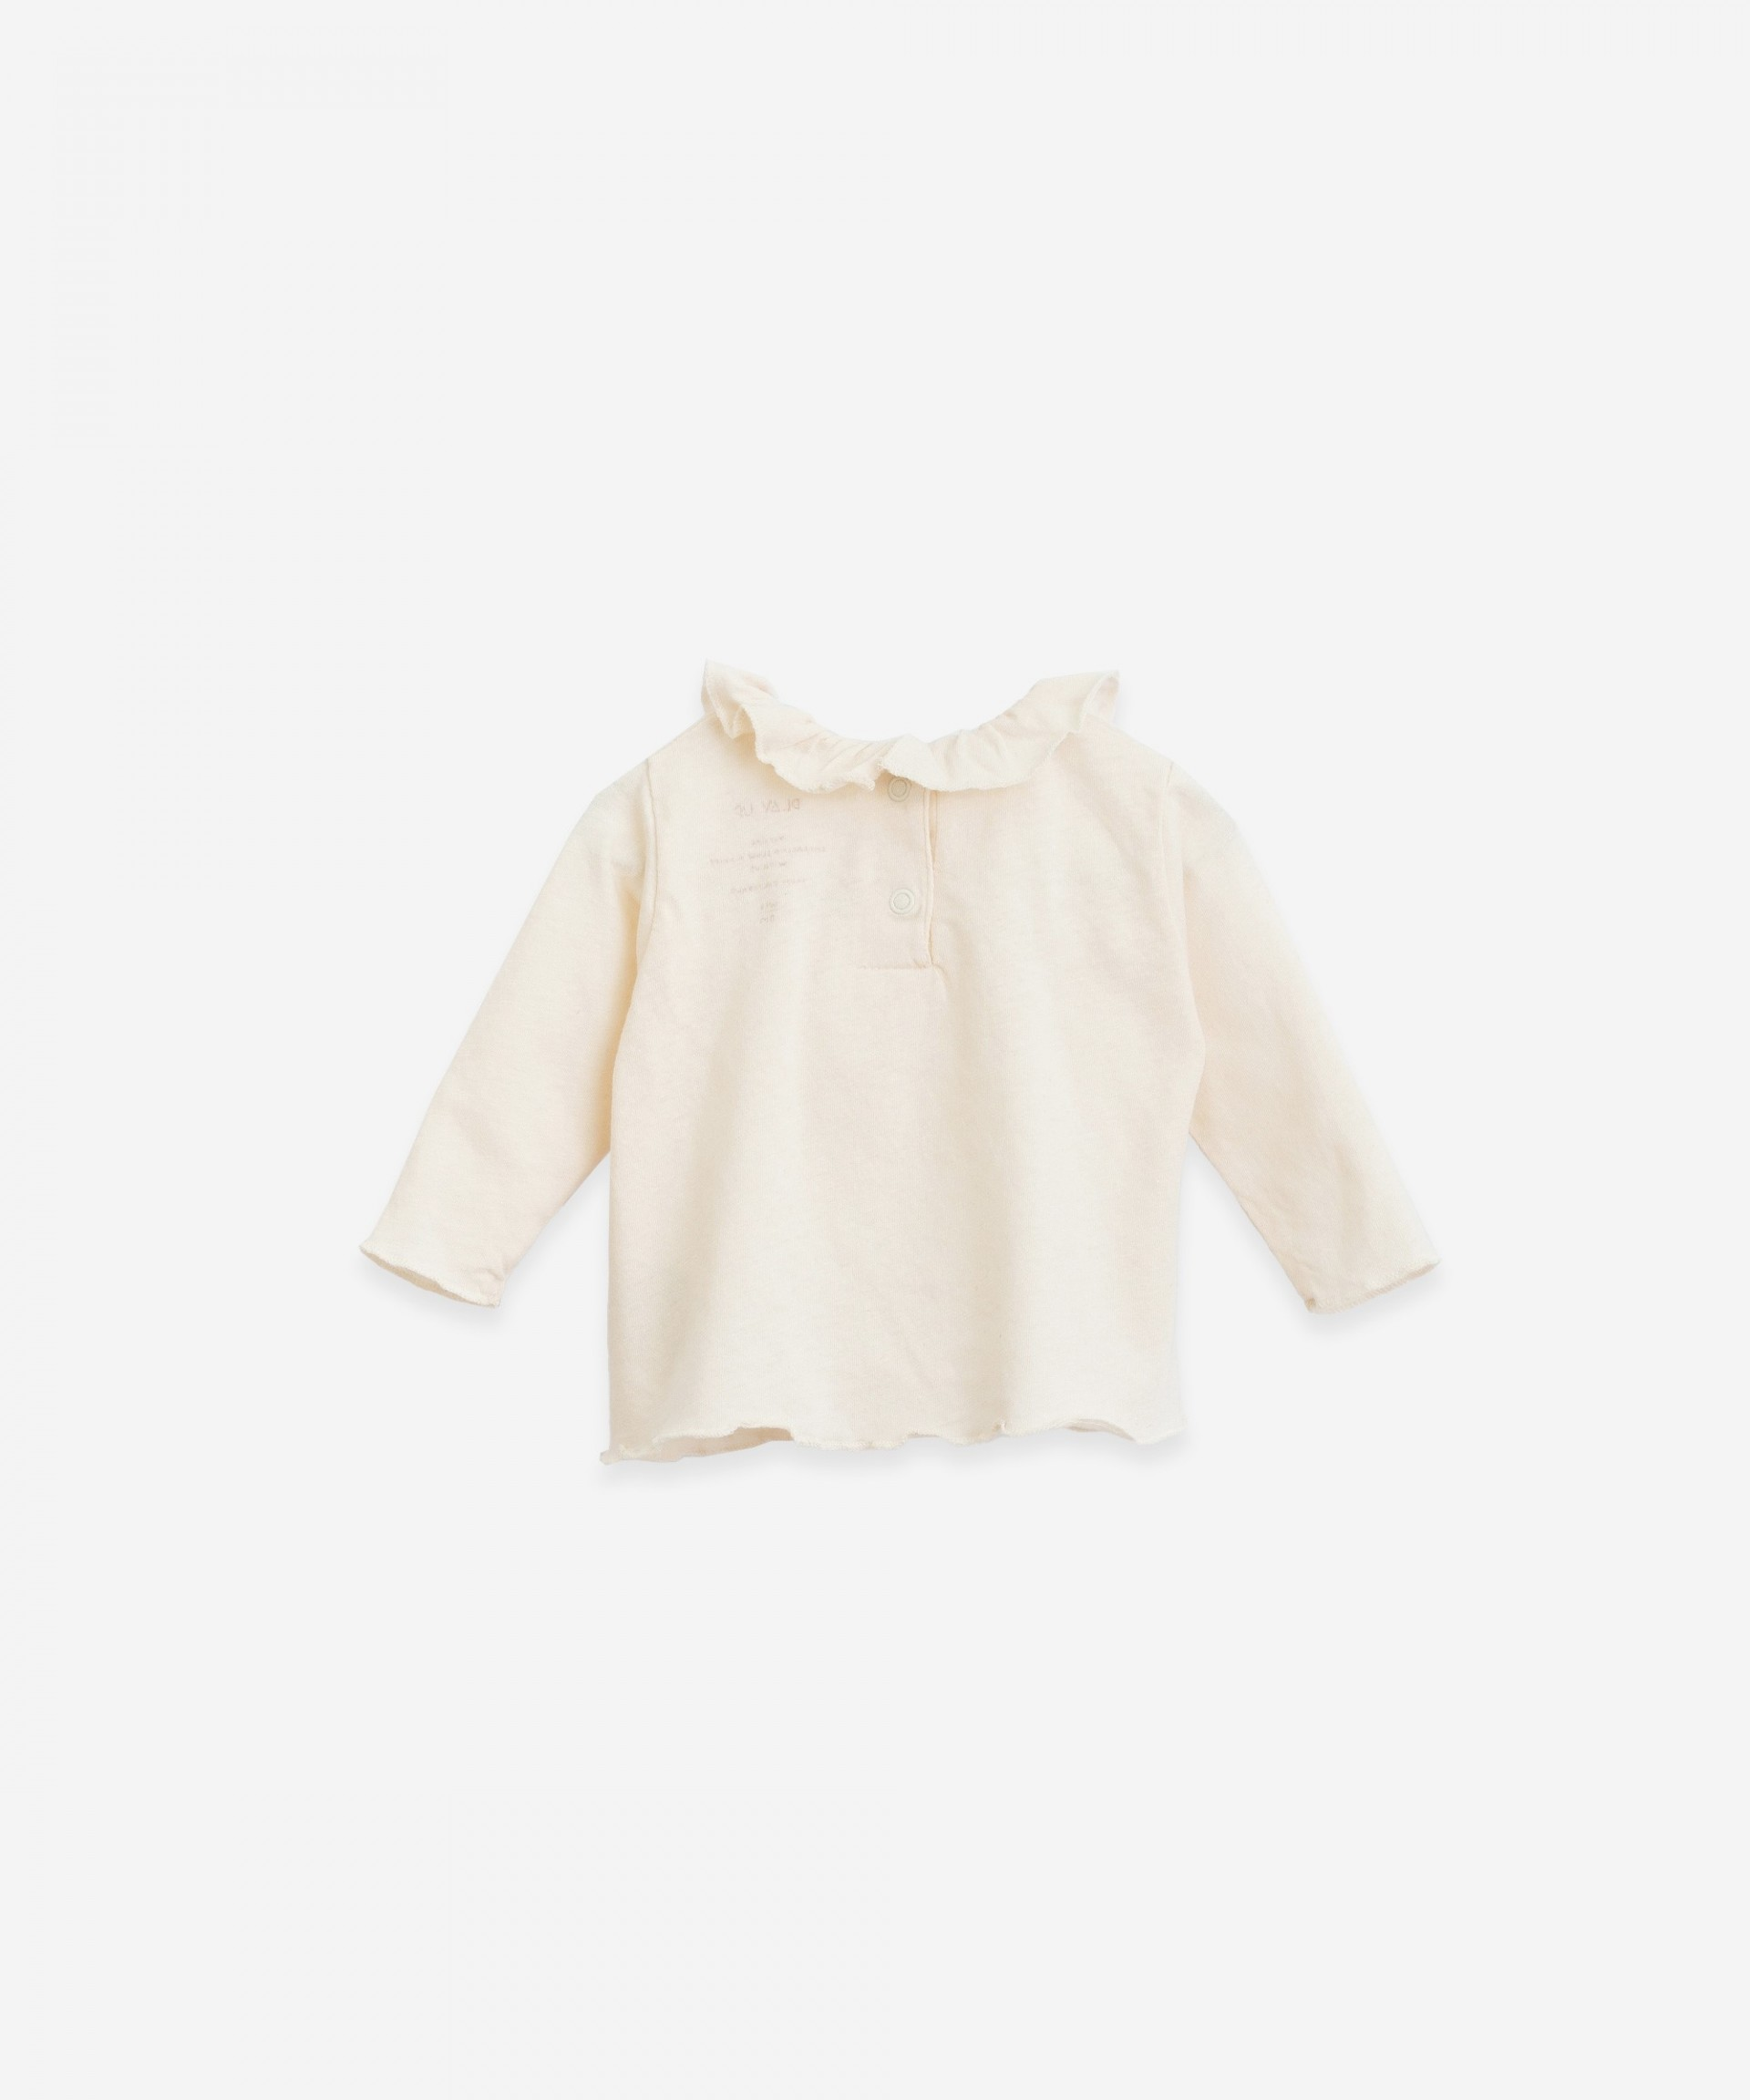 T-shirt with pleats| Botany